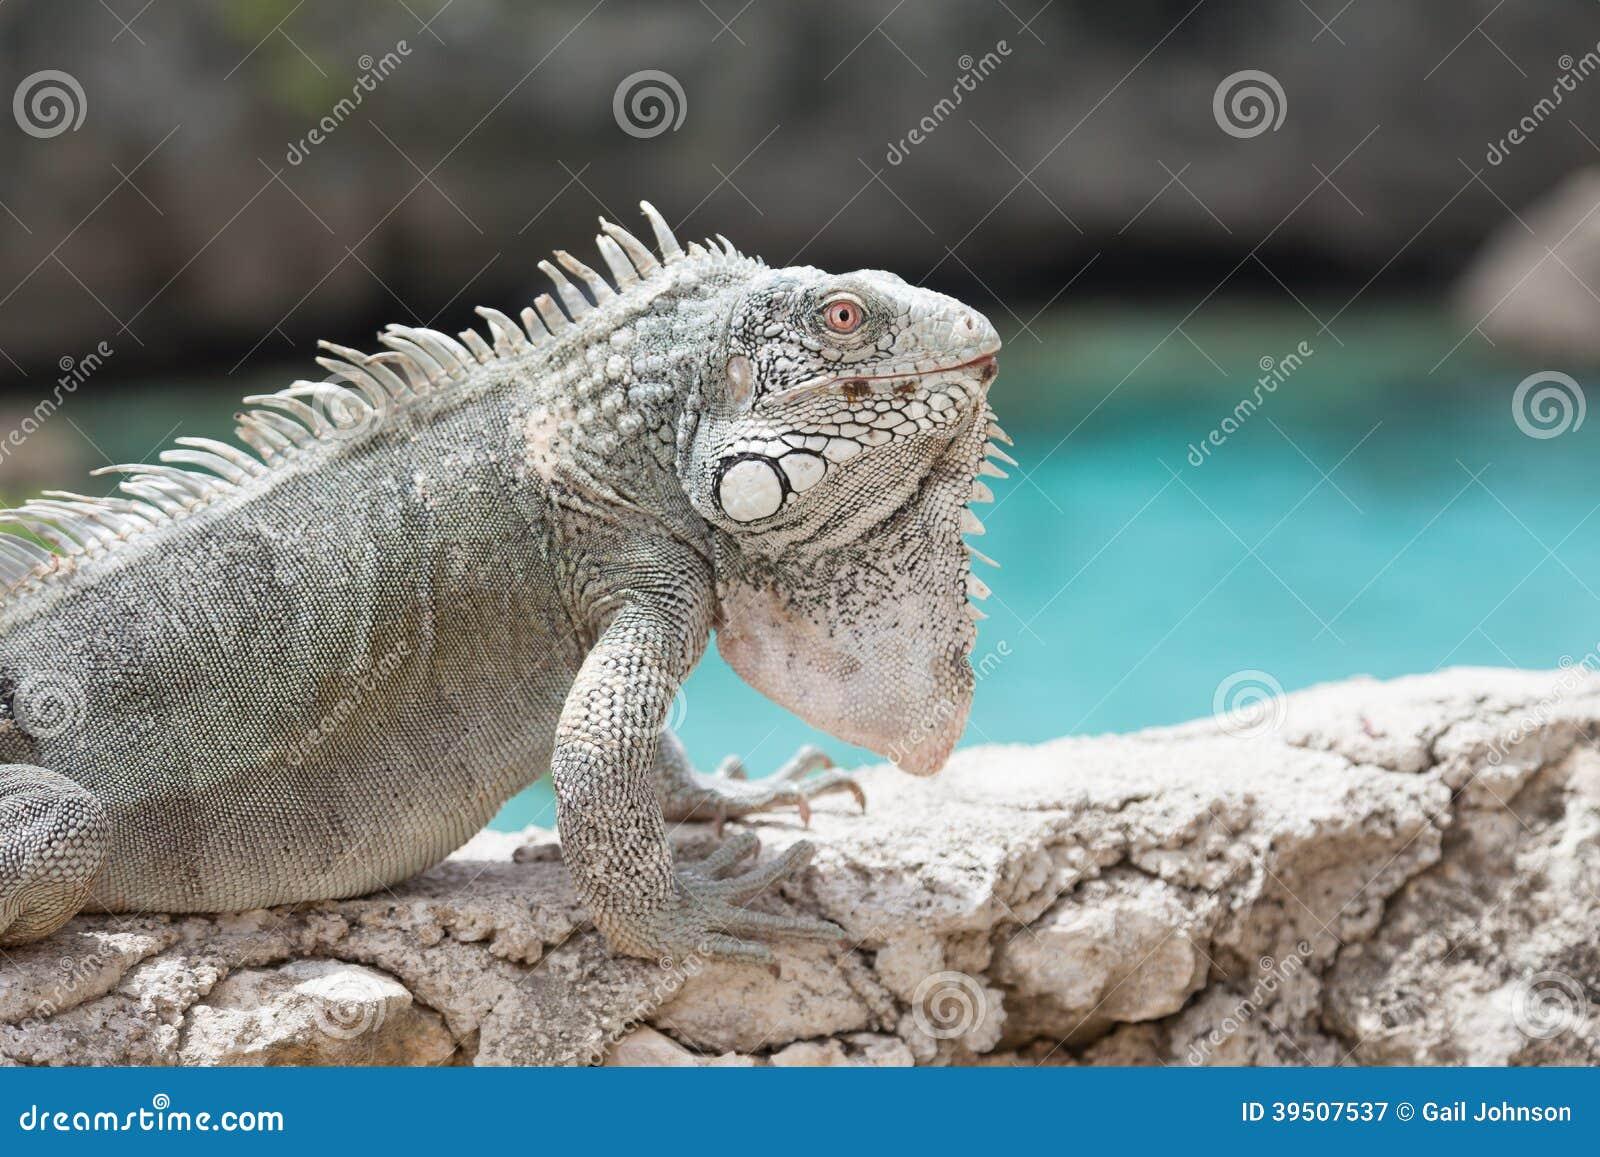 Iguana on a wall with the sea